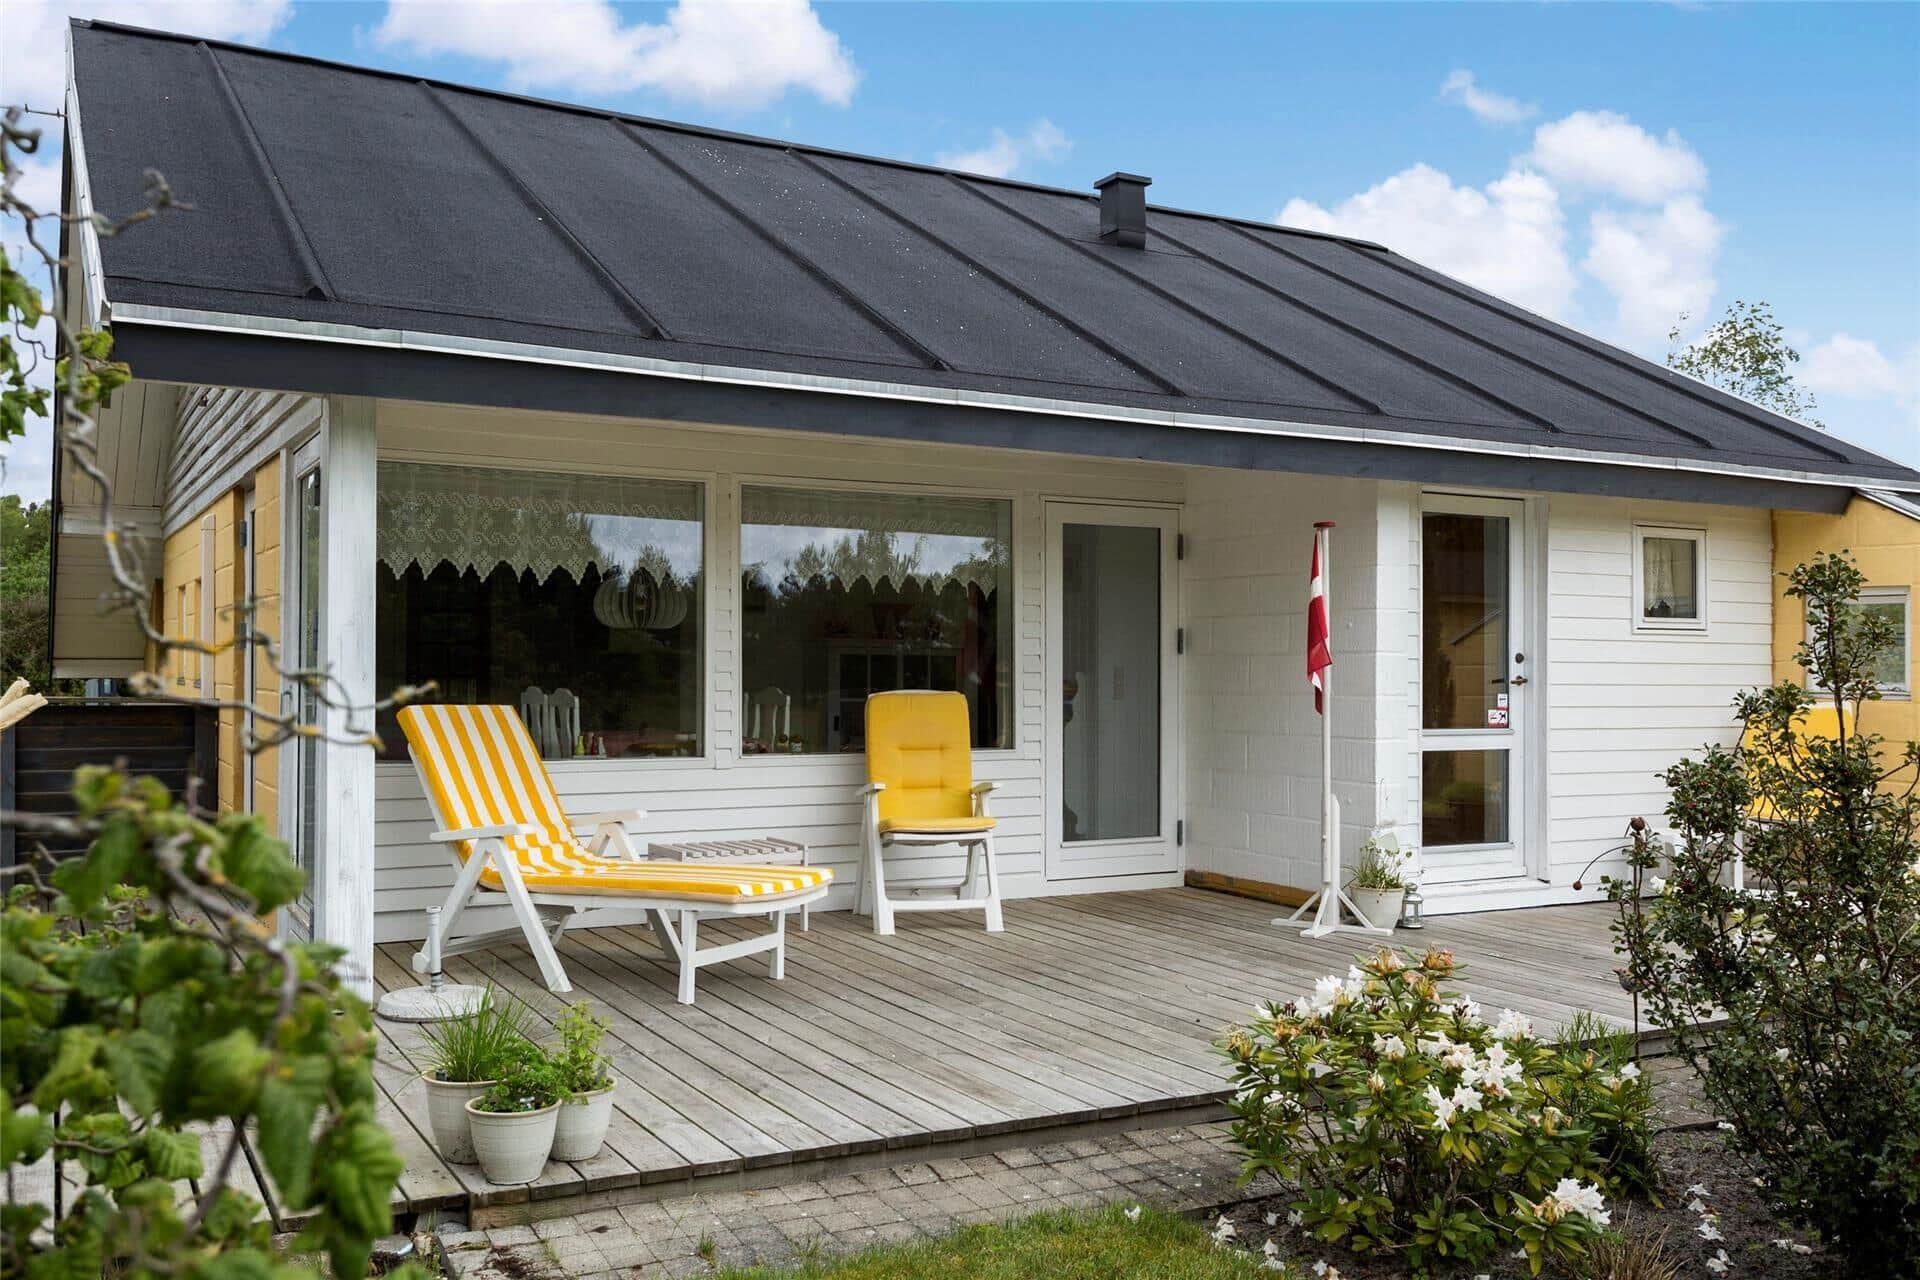 Billede 1-401 Sommerhus HA260, Lyngtoften 13, DK - 9370 Hals